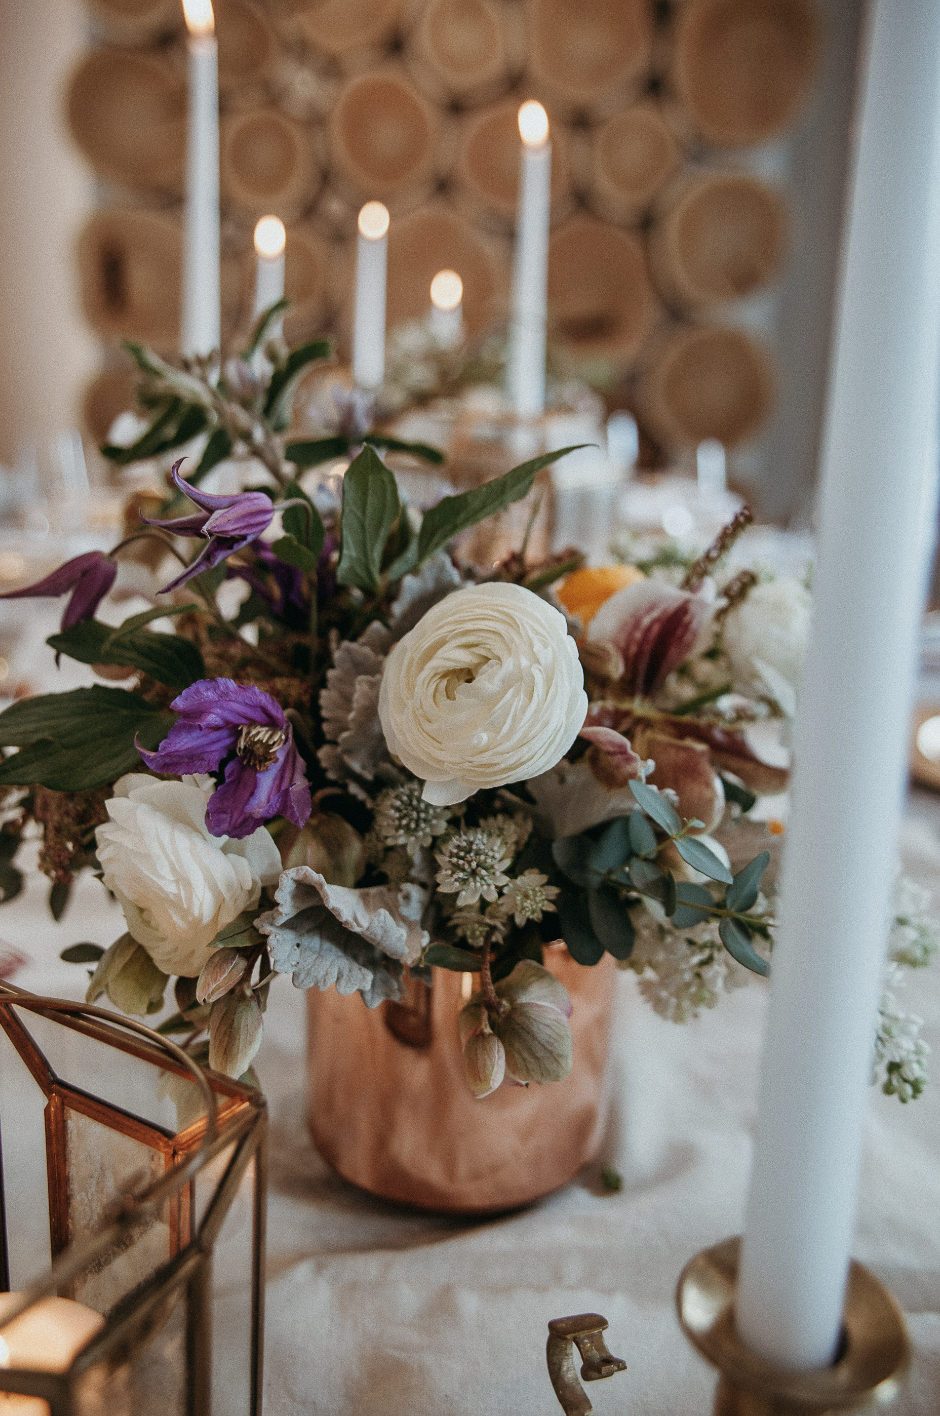 Wedding Floral Centrepiece.png